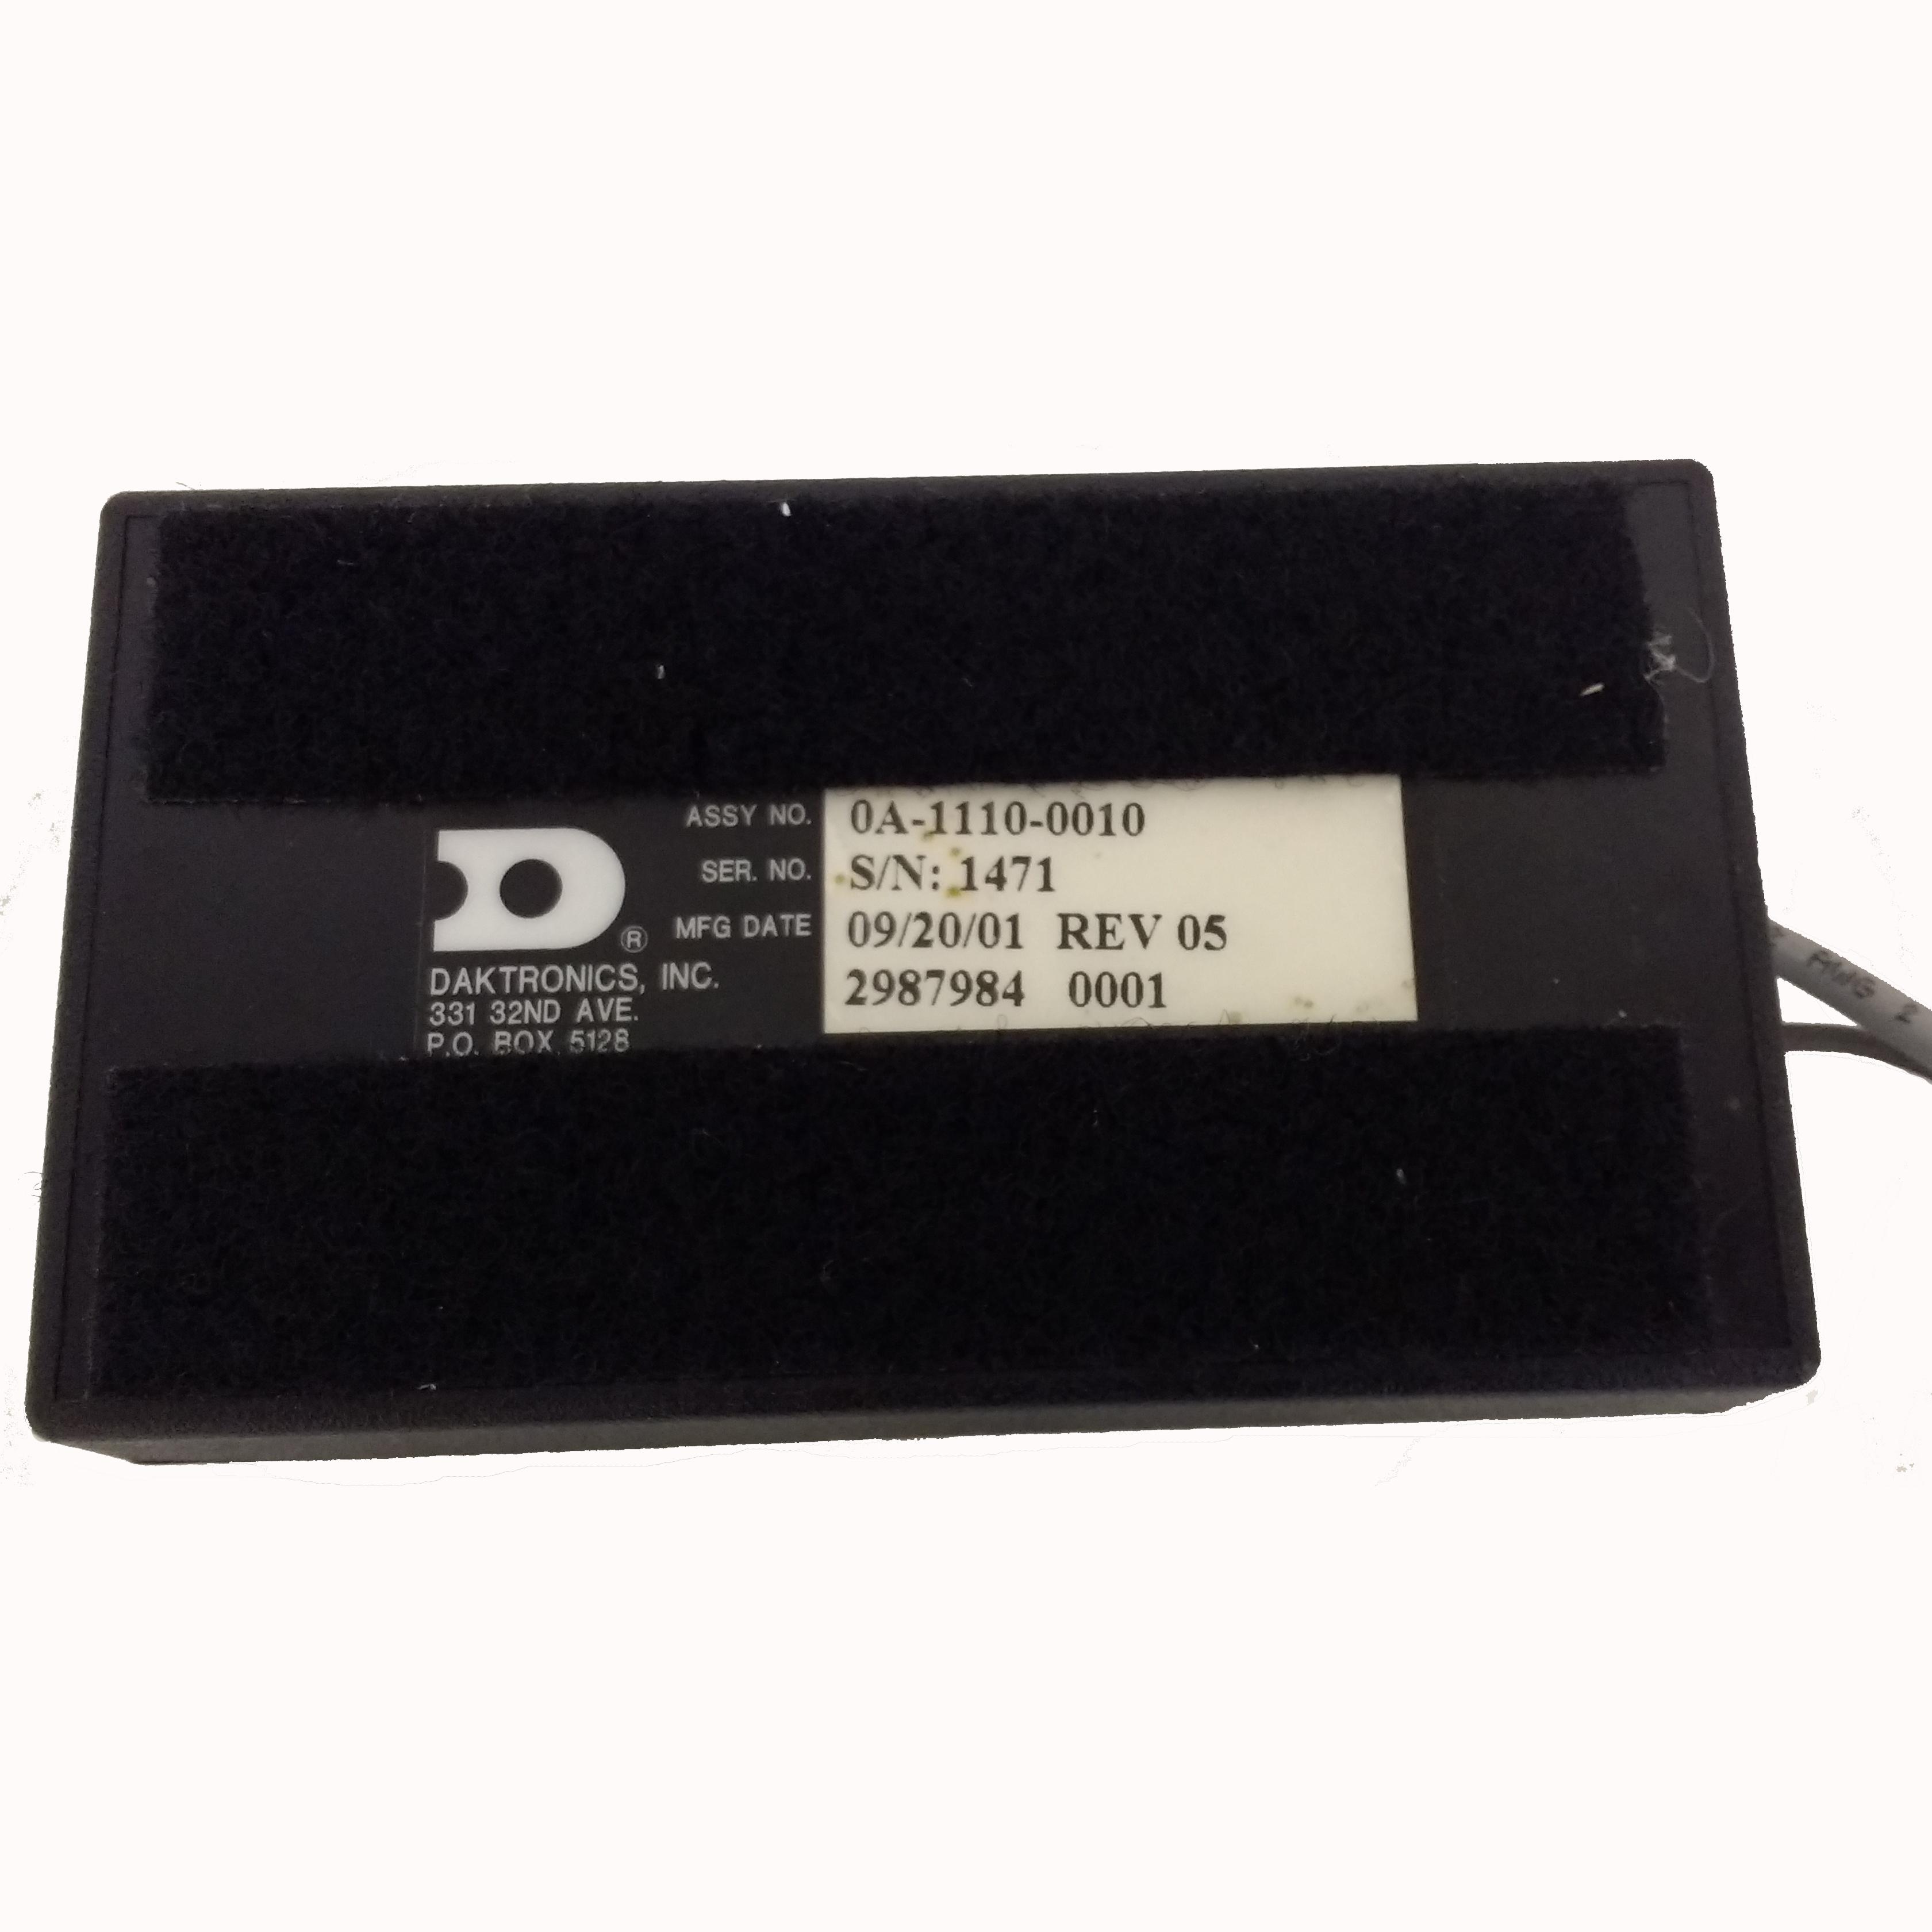 (0A-1110-0010) Daktronics Gen III Radio Receiver (Refurbished) 1